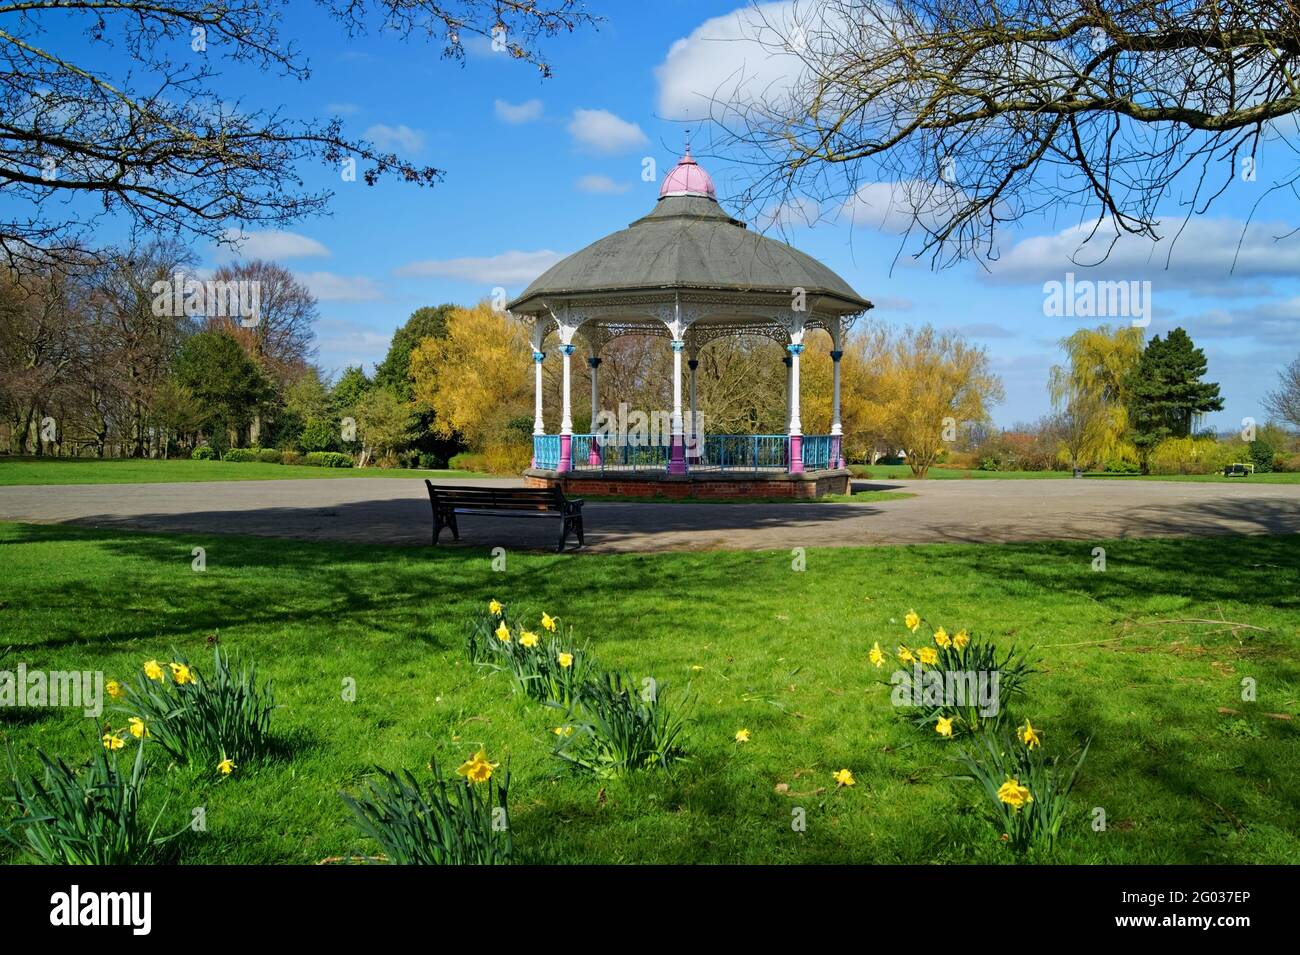 UK,South Yorkshire,Barnsley,Locke Park Bandstand Stock Photo